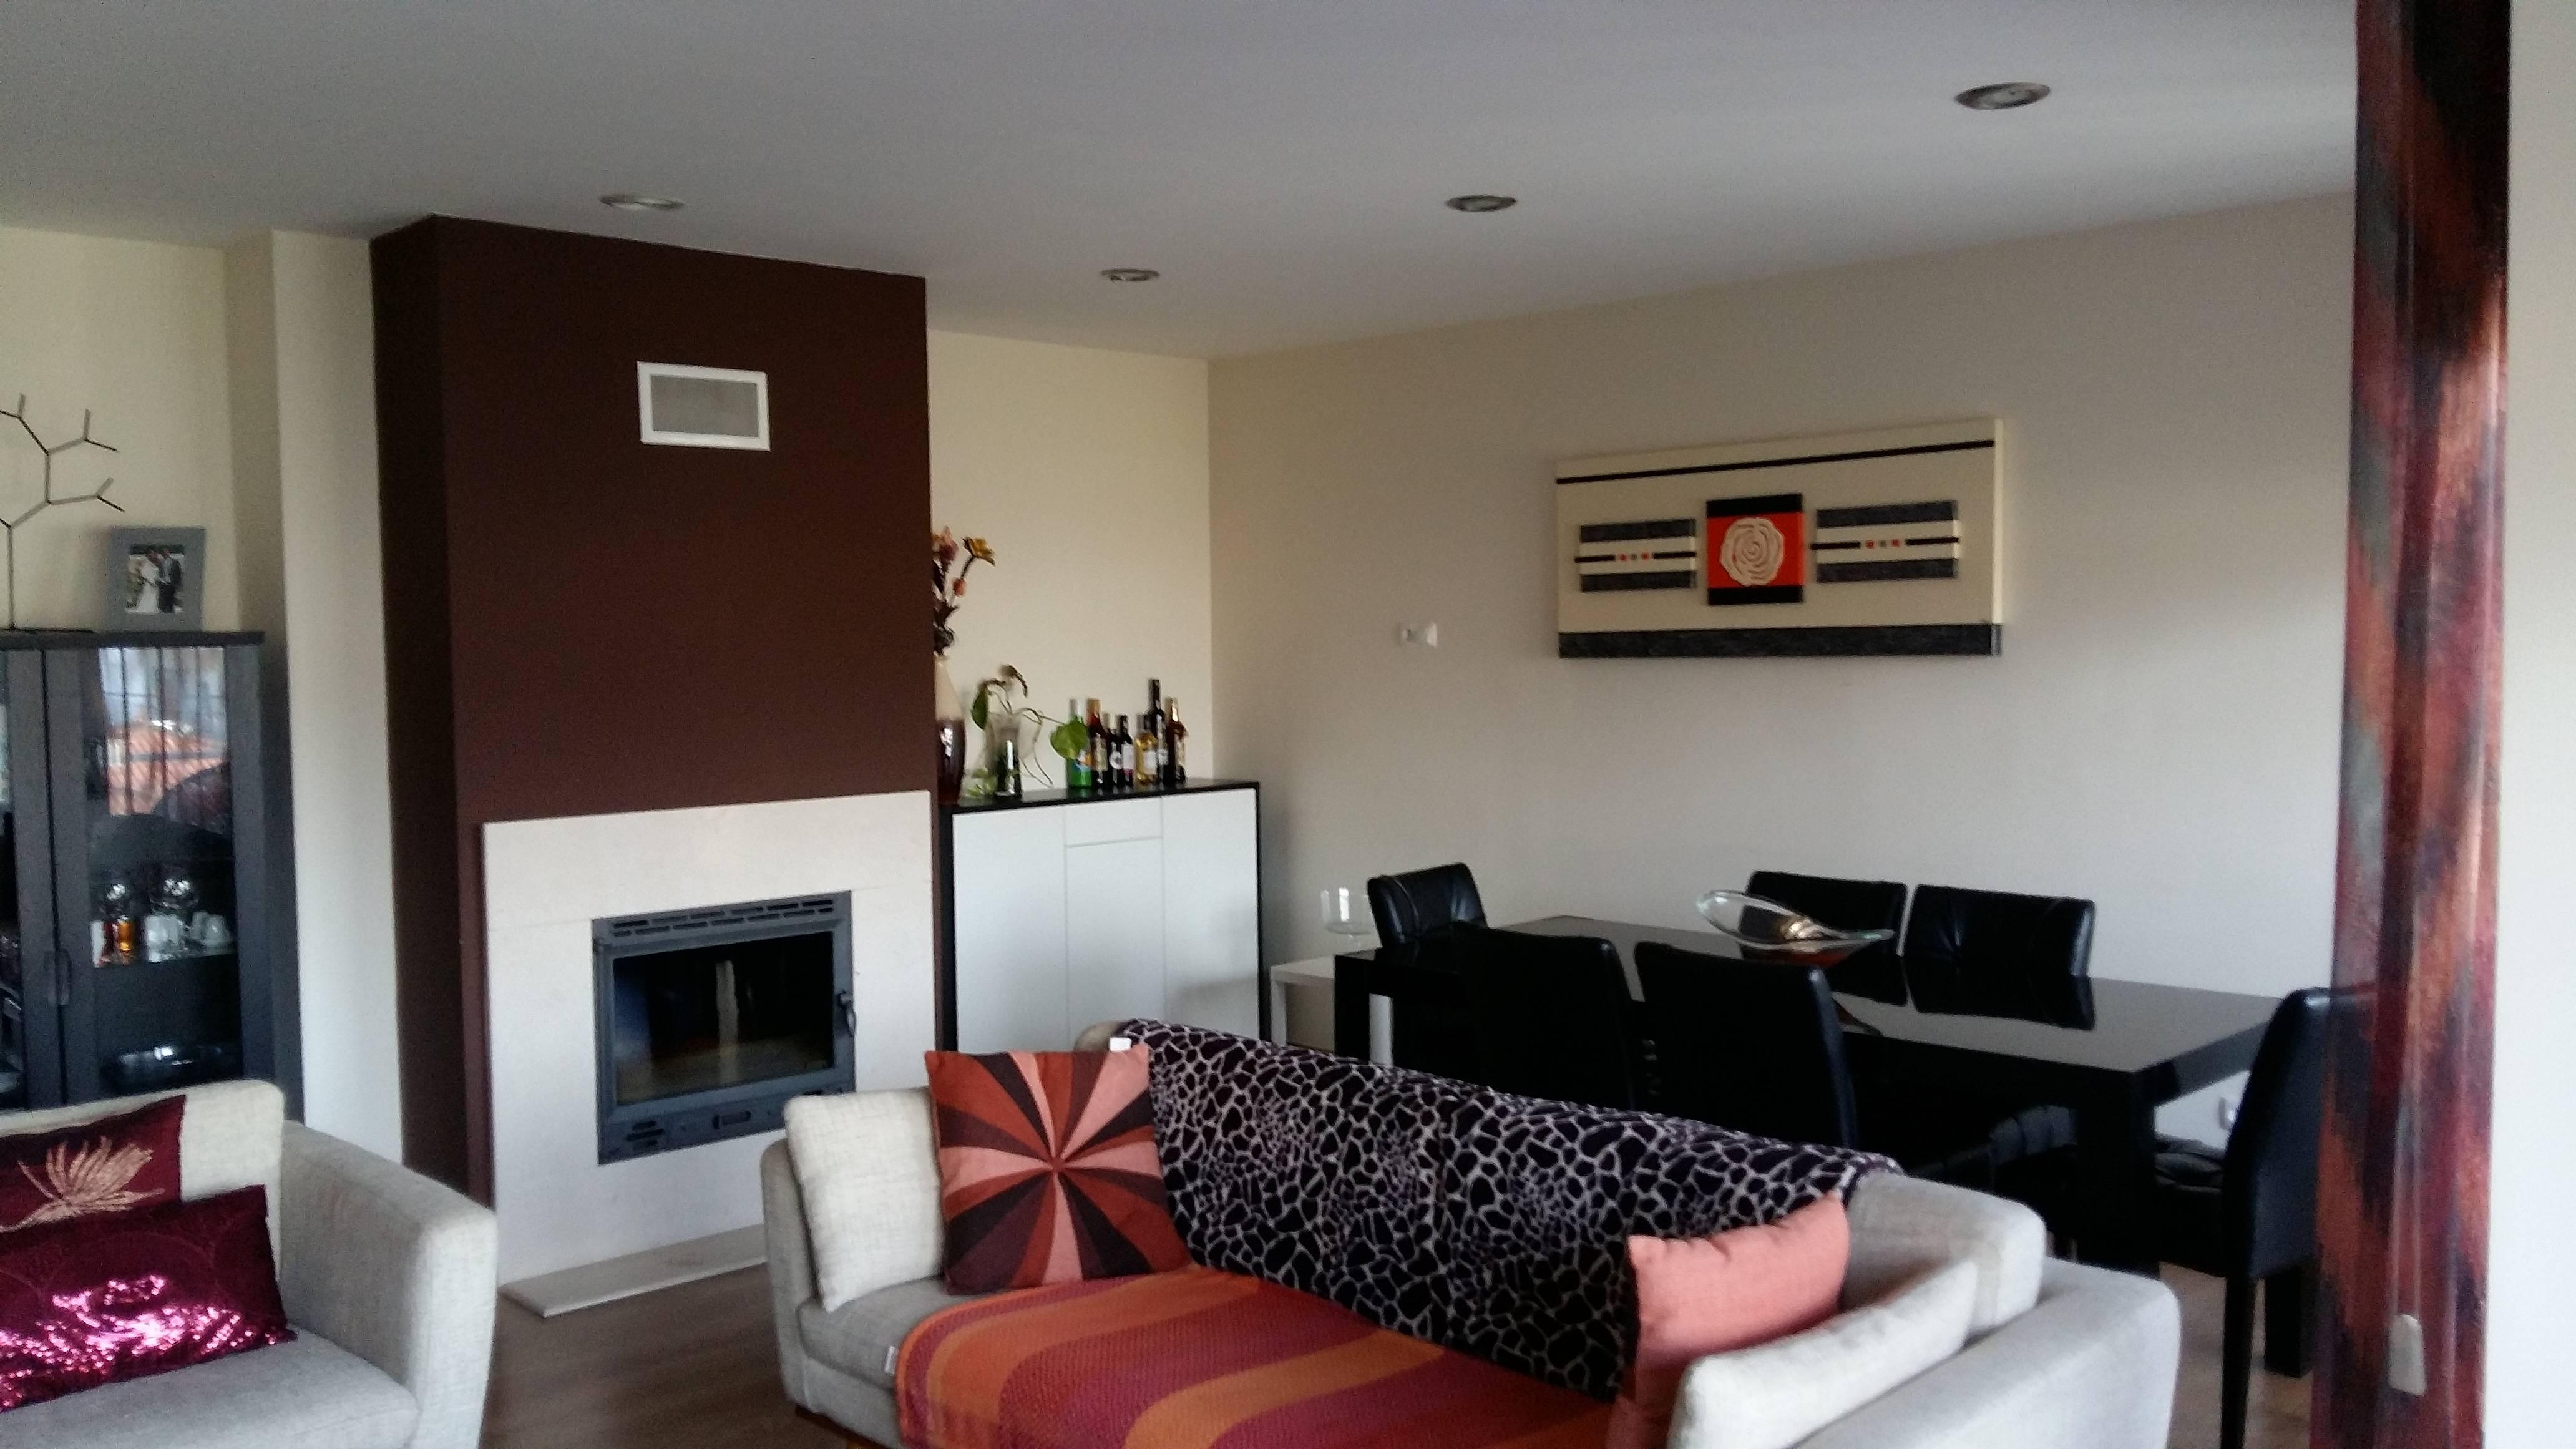 Aluguer apartamentos azambuja apartamentos azambuja lisboa - Apartamentos en lisboa baratos ...